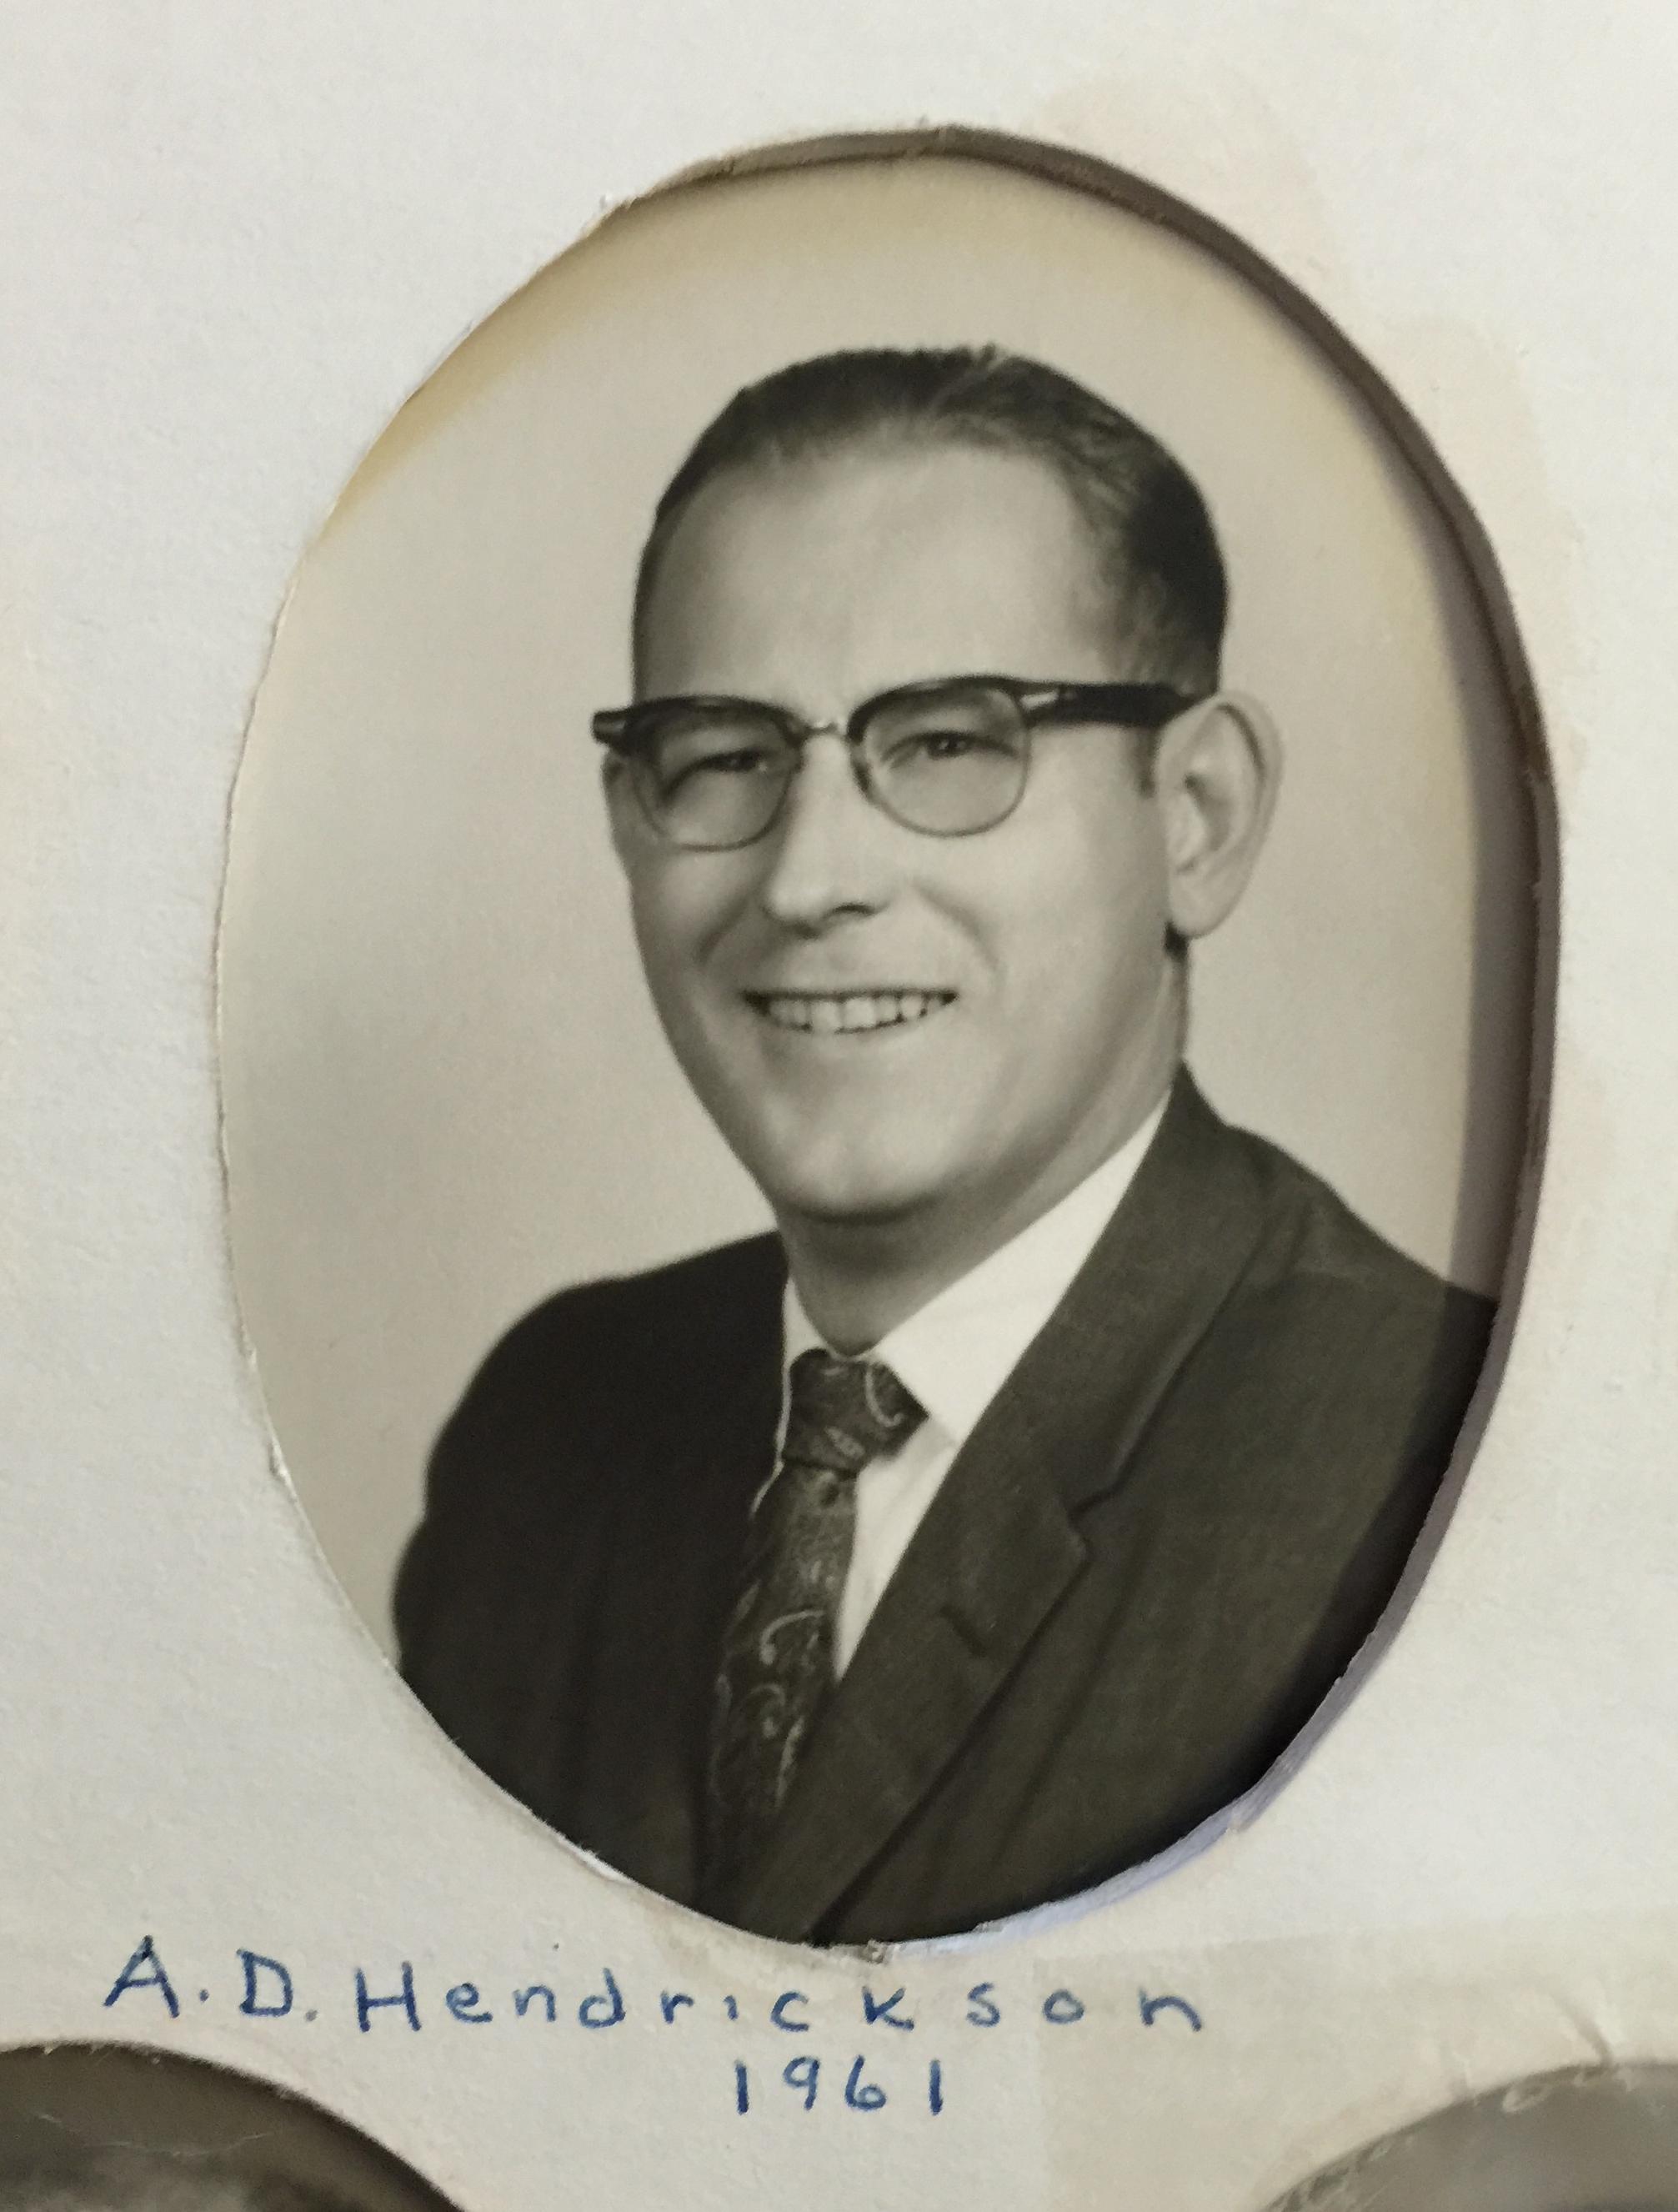 1961 A.D. Hendrickson